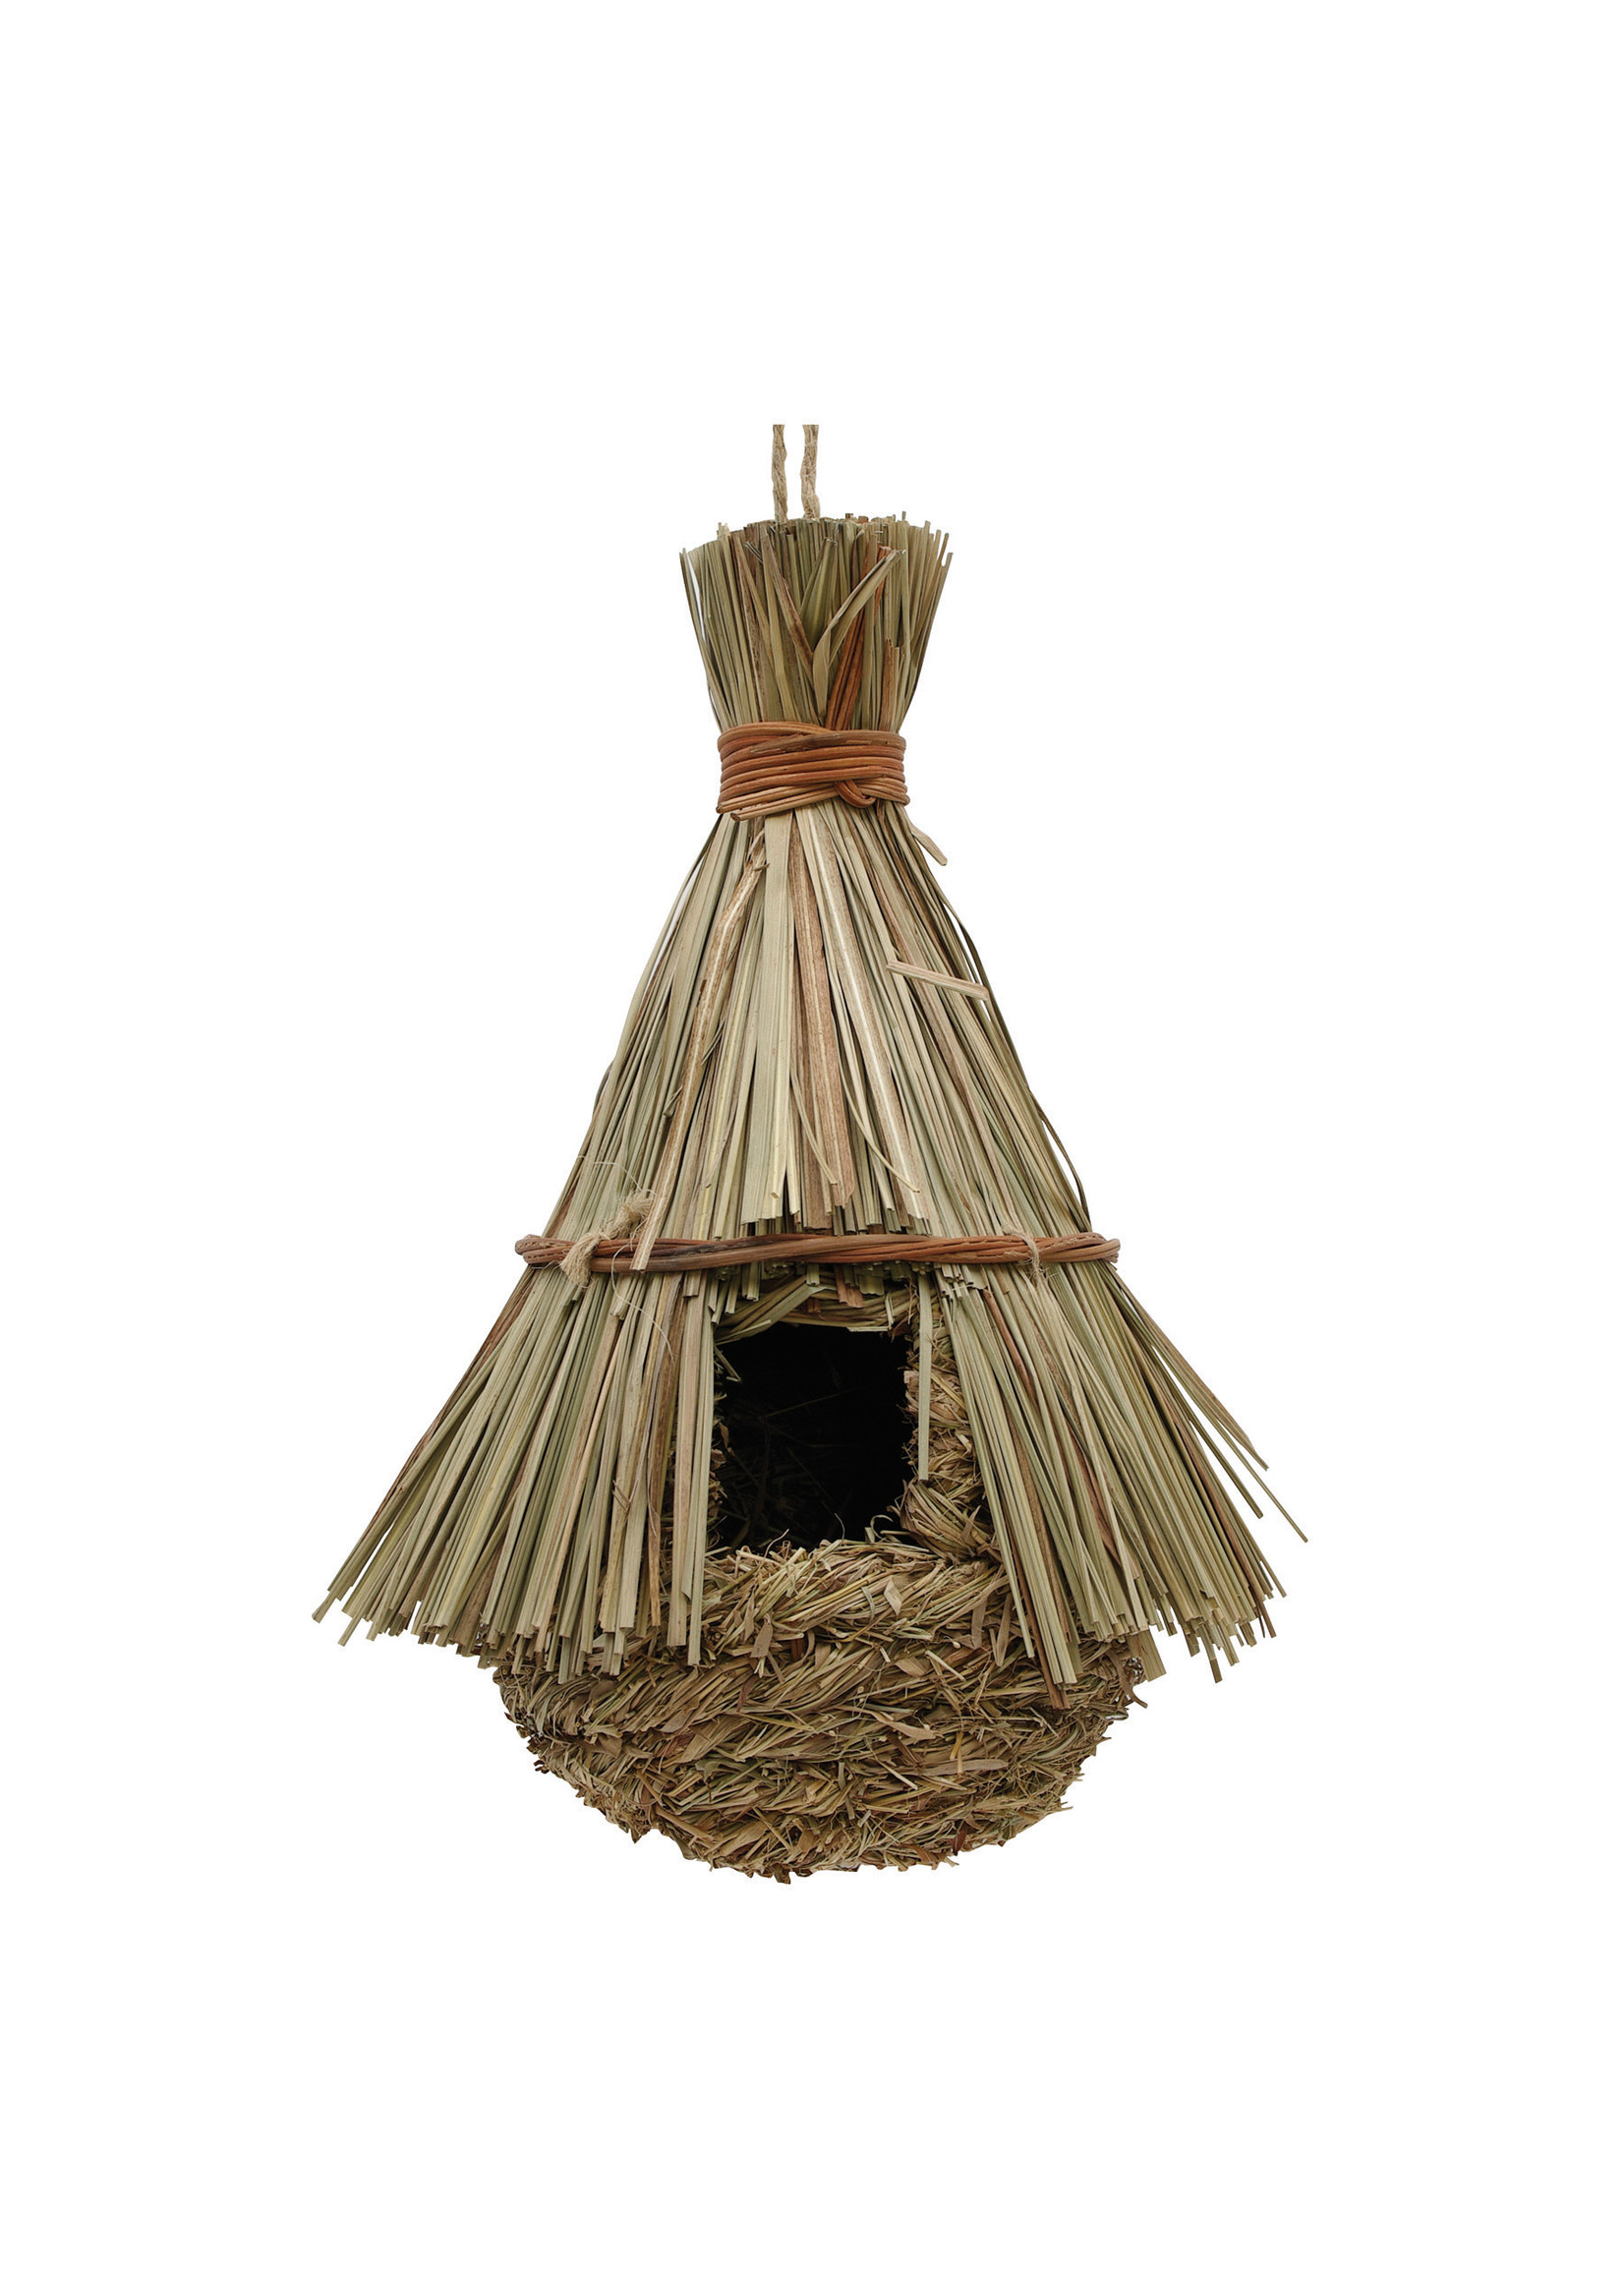 Living World Living World Outside Nest, Reed w/Grass, Hut